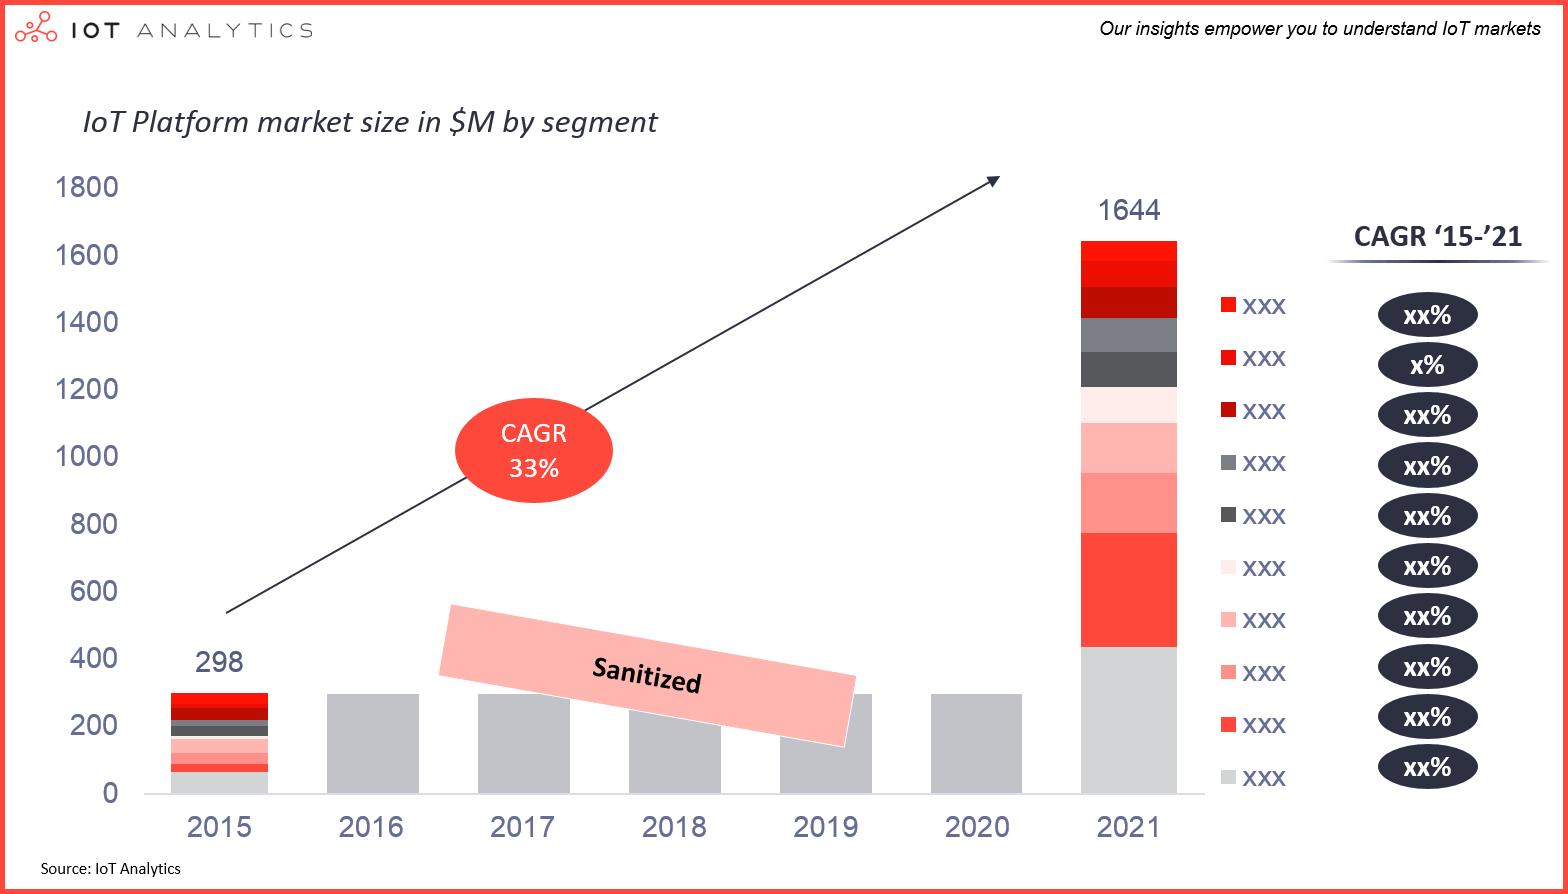 IoT Platforms Market 2015 - 2021 by segment